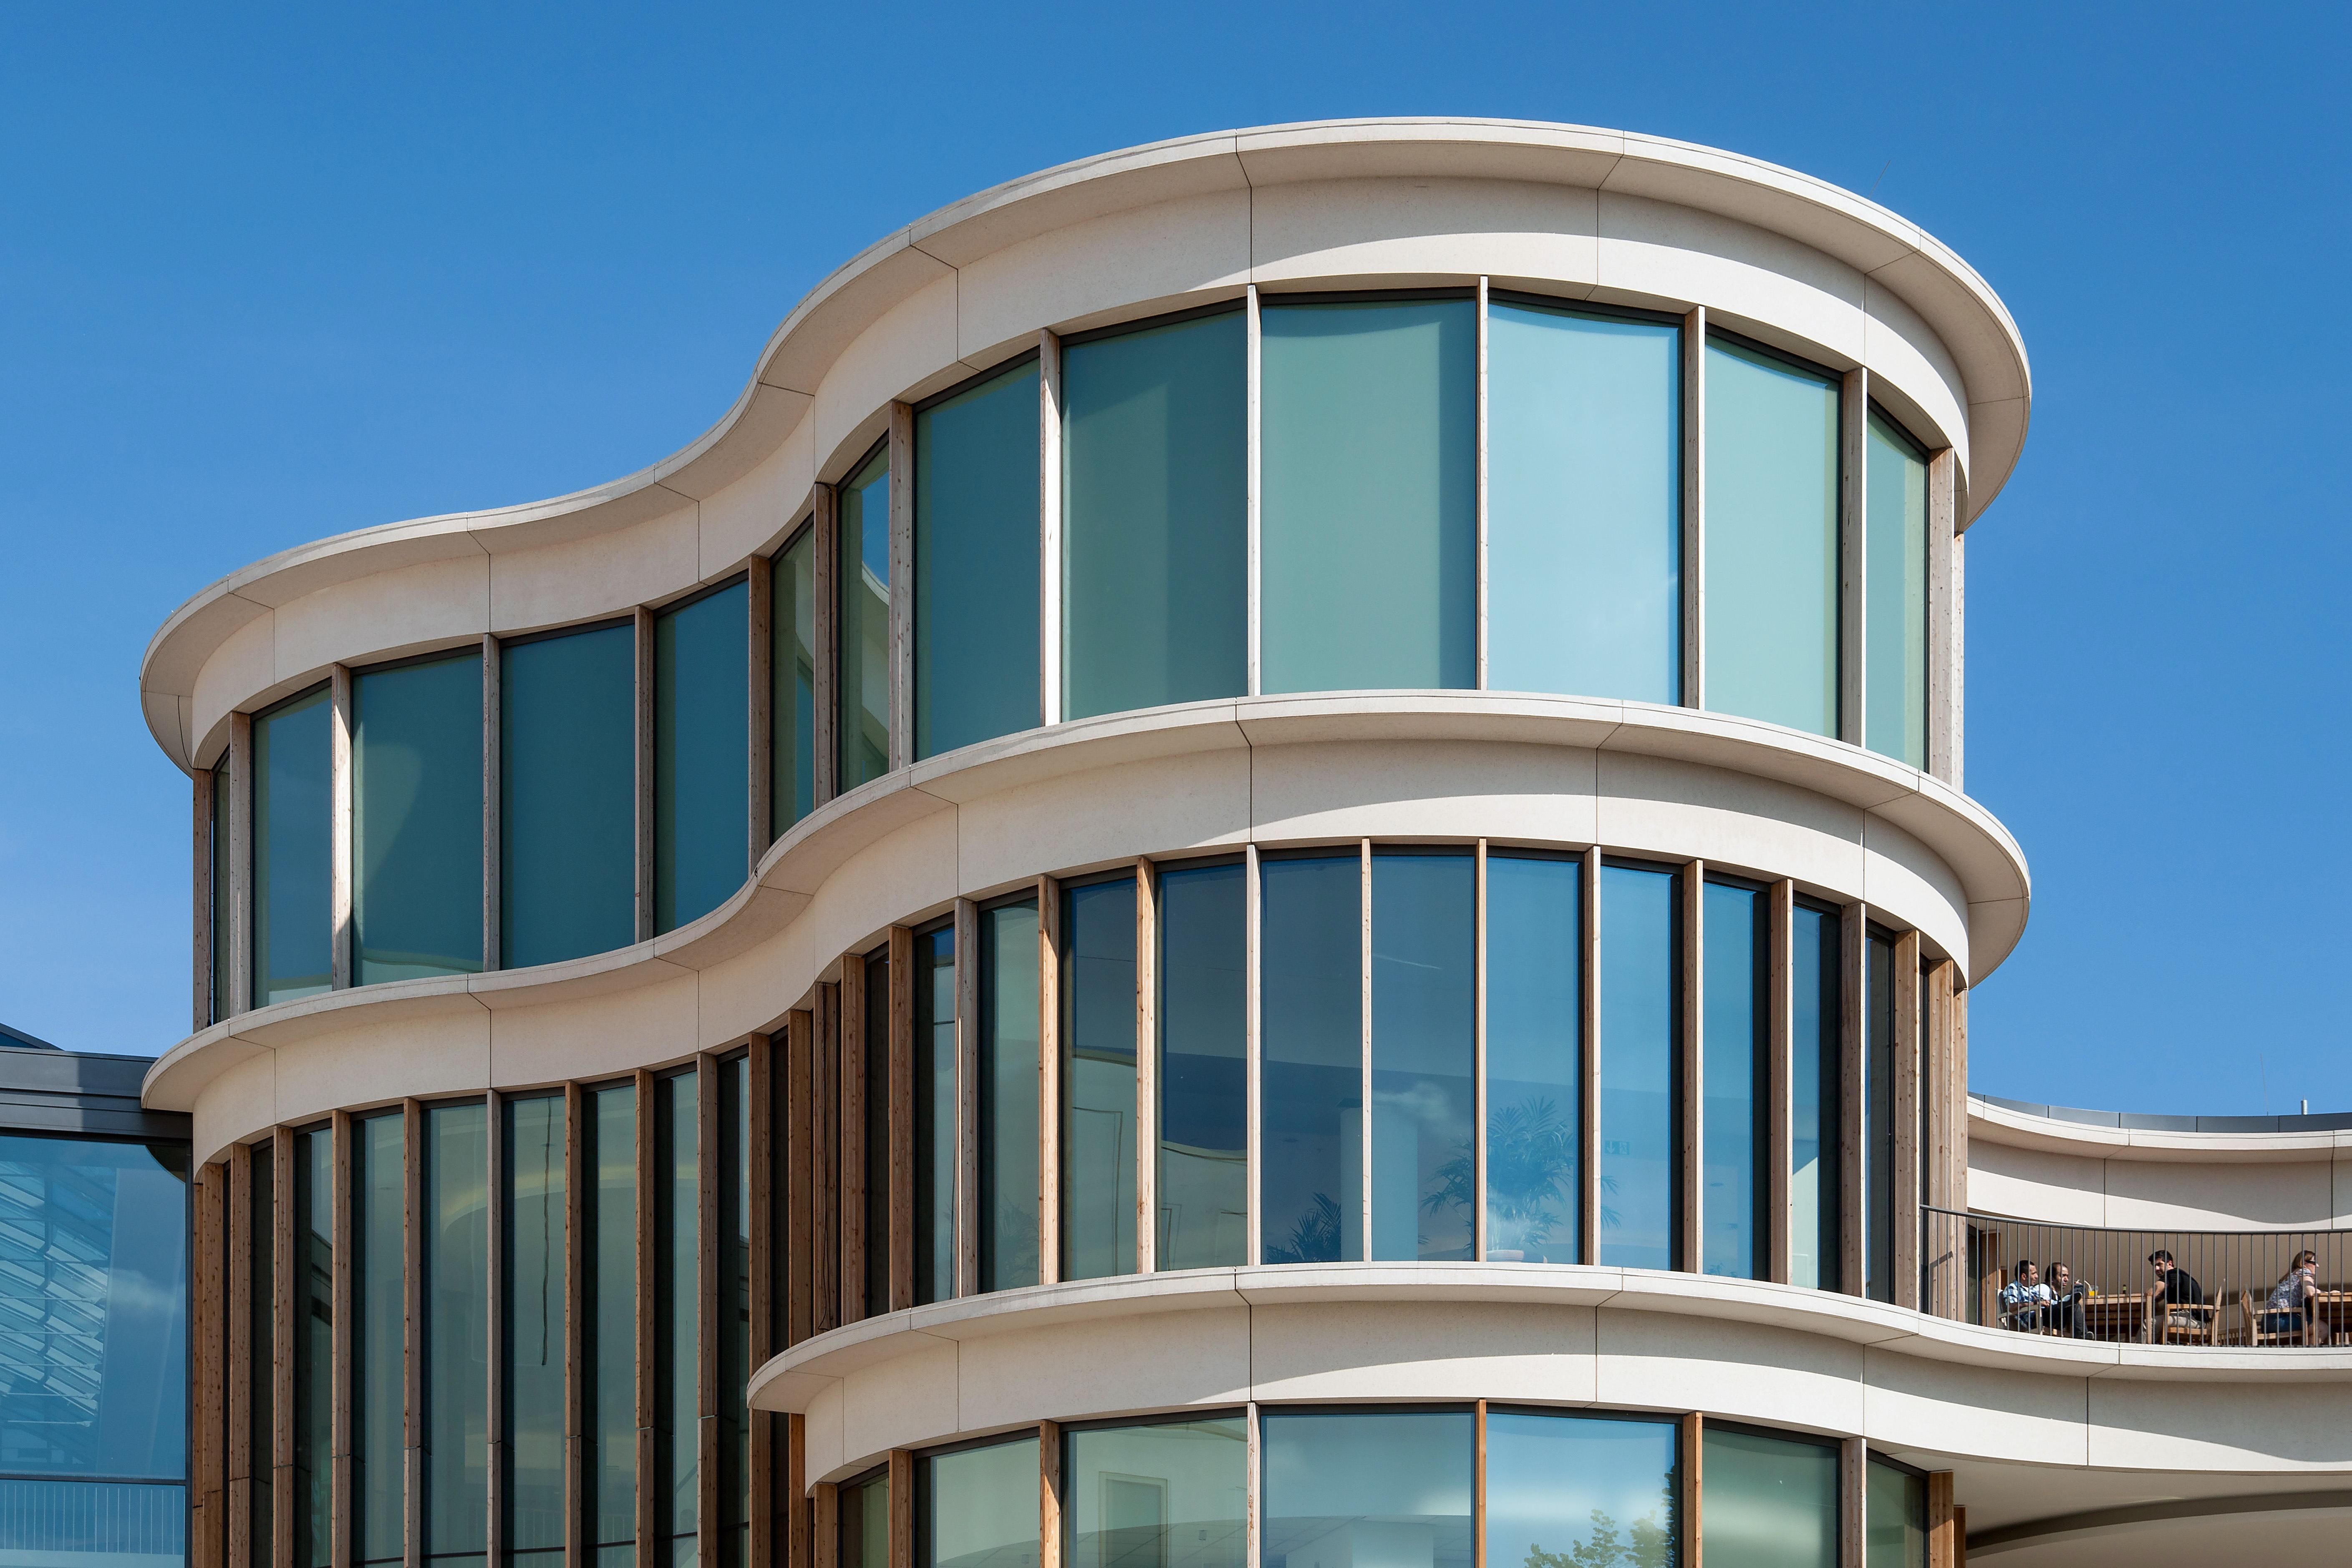 einkaufszentrum boulevard berlin terrassenhaus. Black Bedroom Furniture Sets. Home Design Ideas